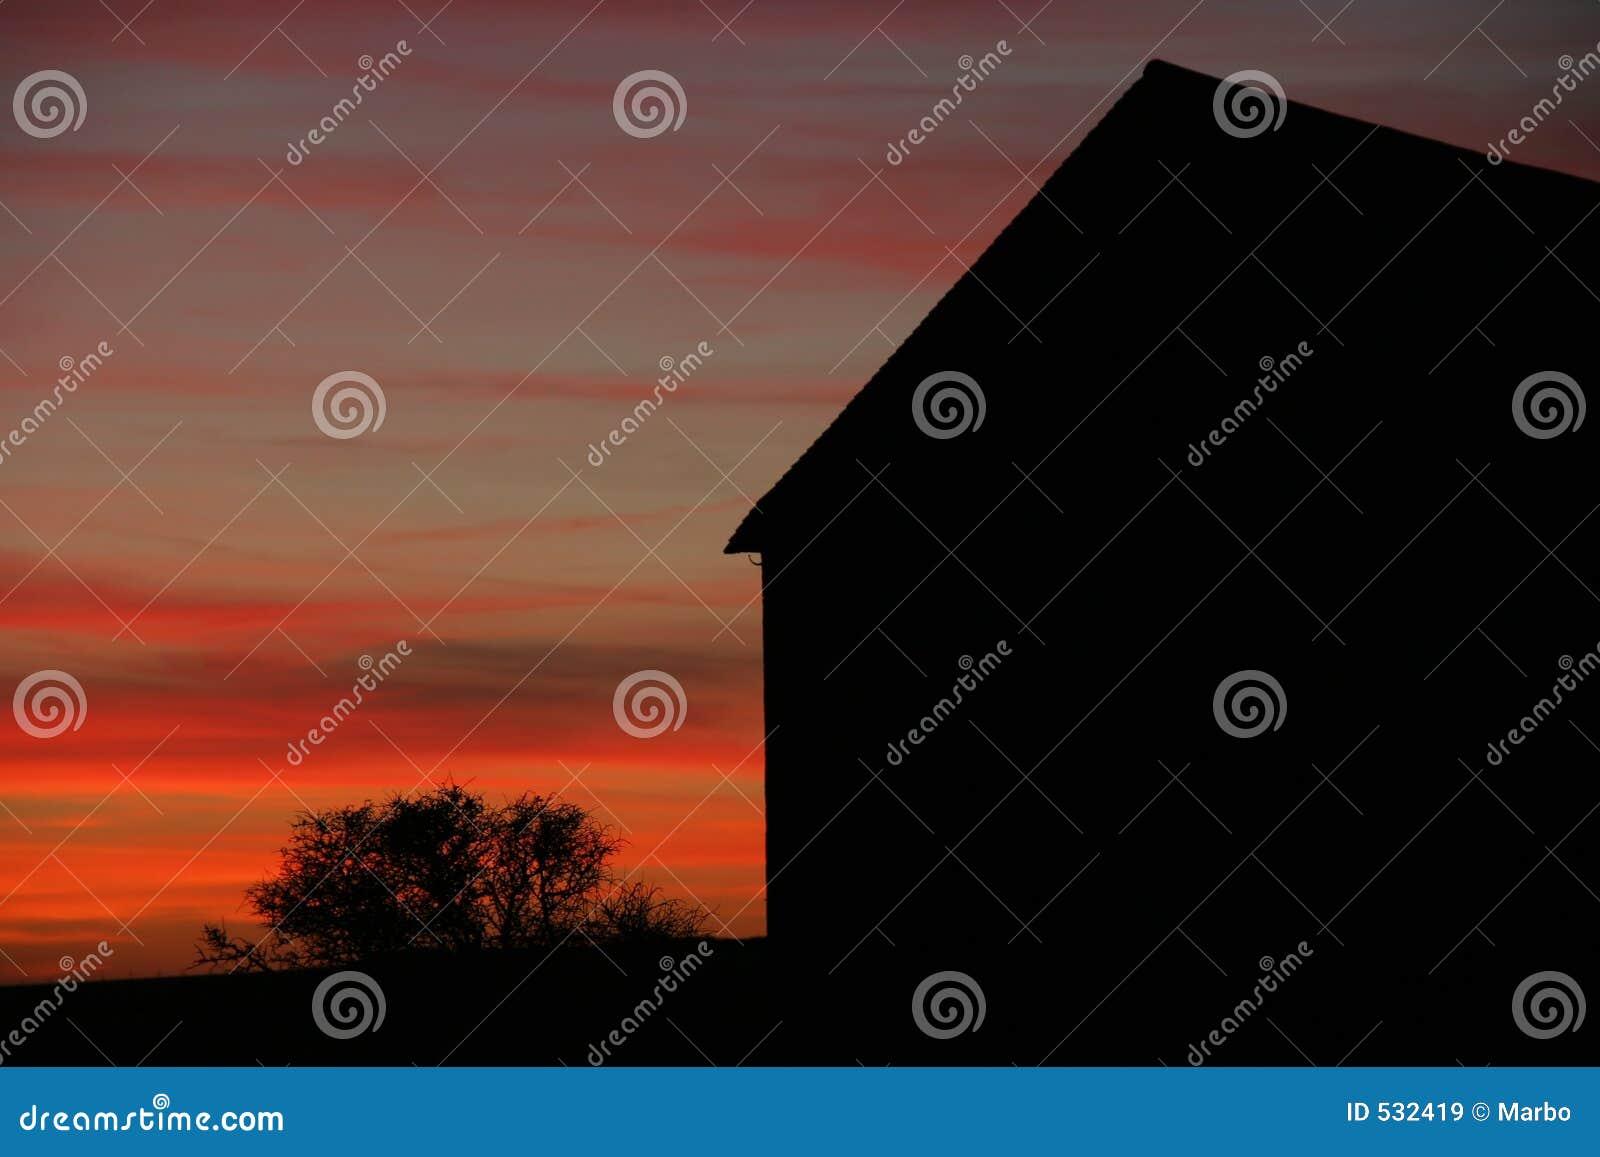 Download 谷仓剪影 库存图片. 图片 包括有 剪影, 红色, 布琼布拉, 天空, 屋顶, 黄昏, 日落, 灌木, 农场 - 532419